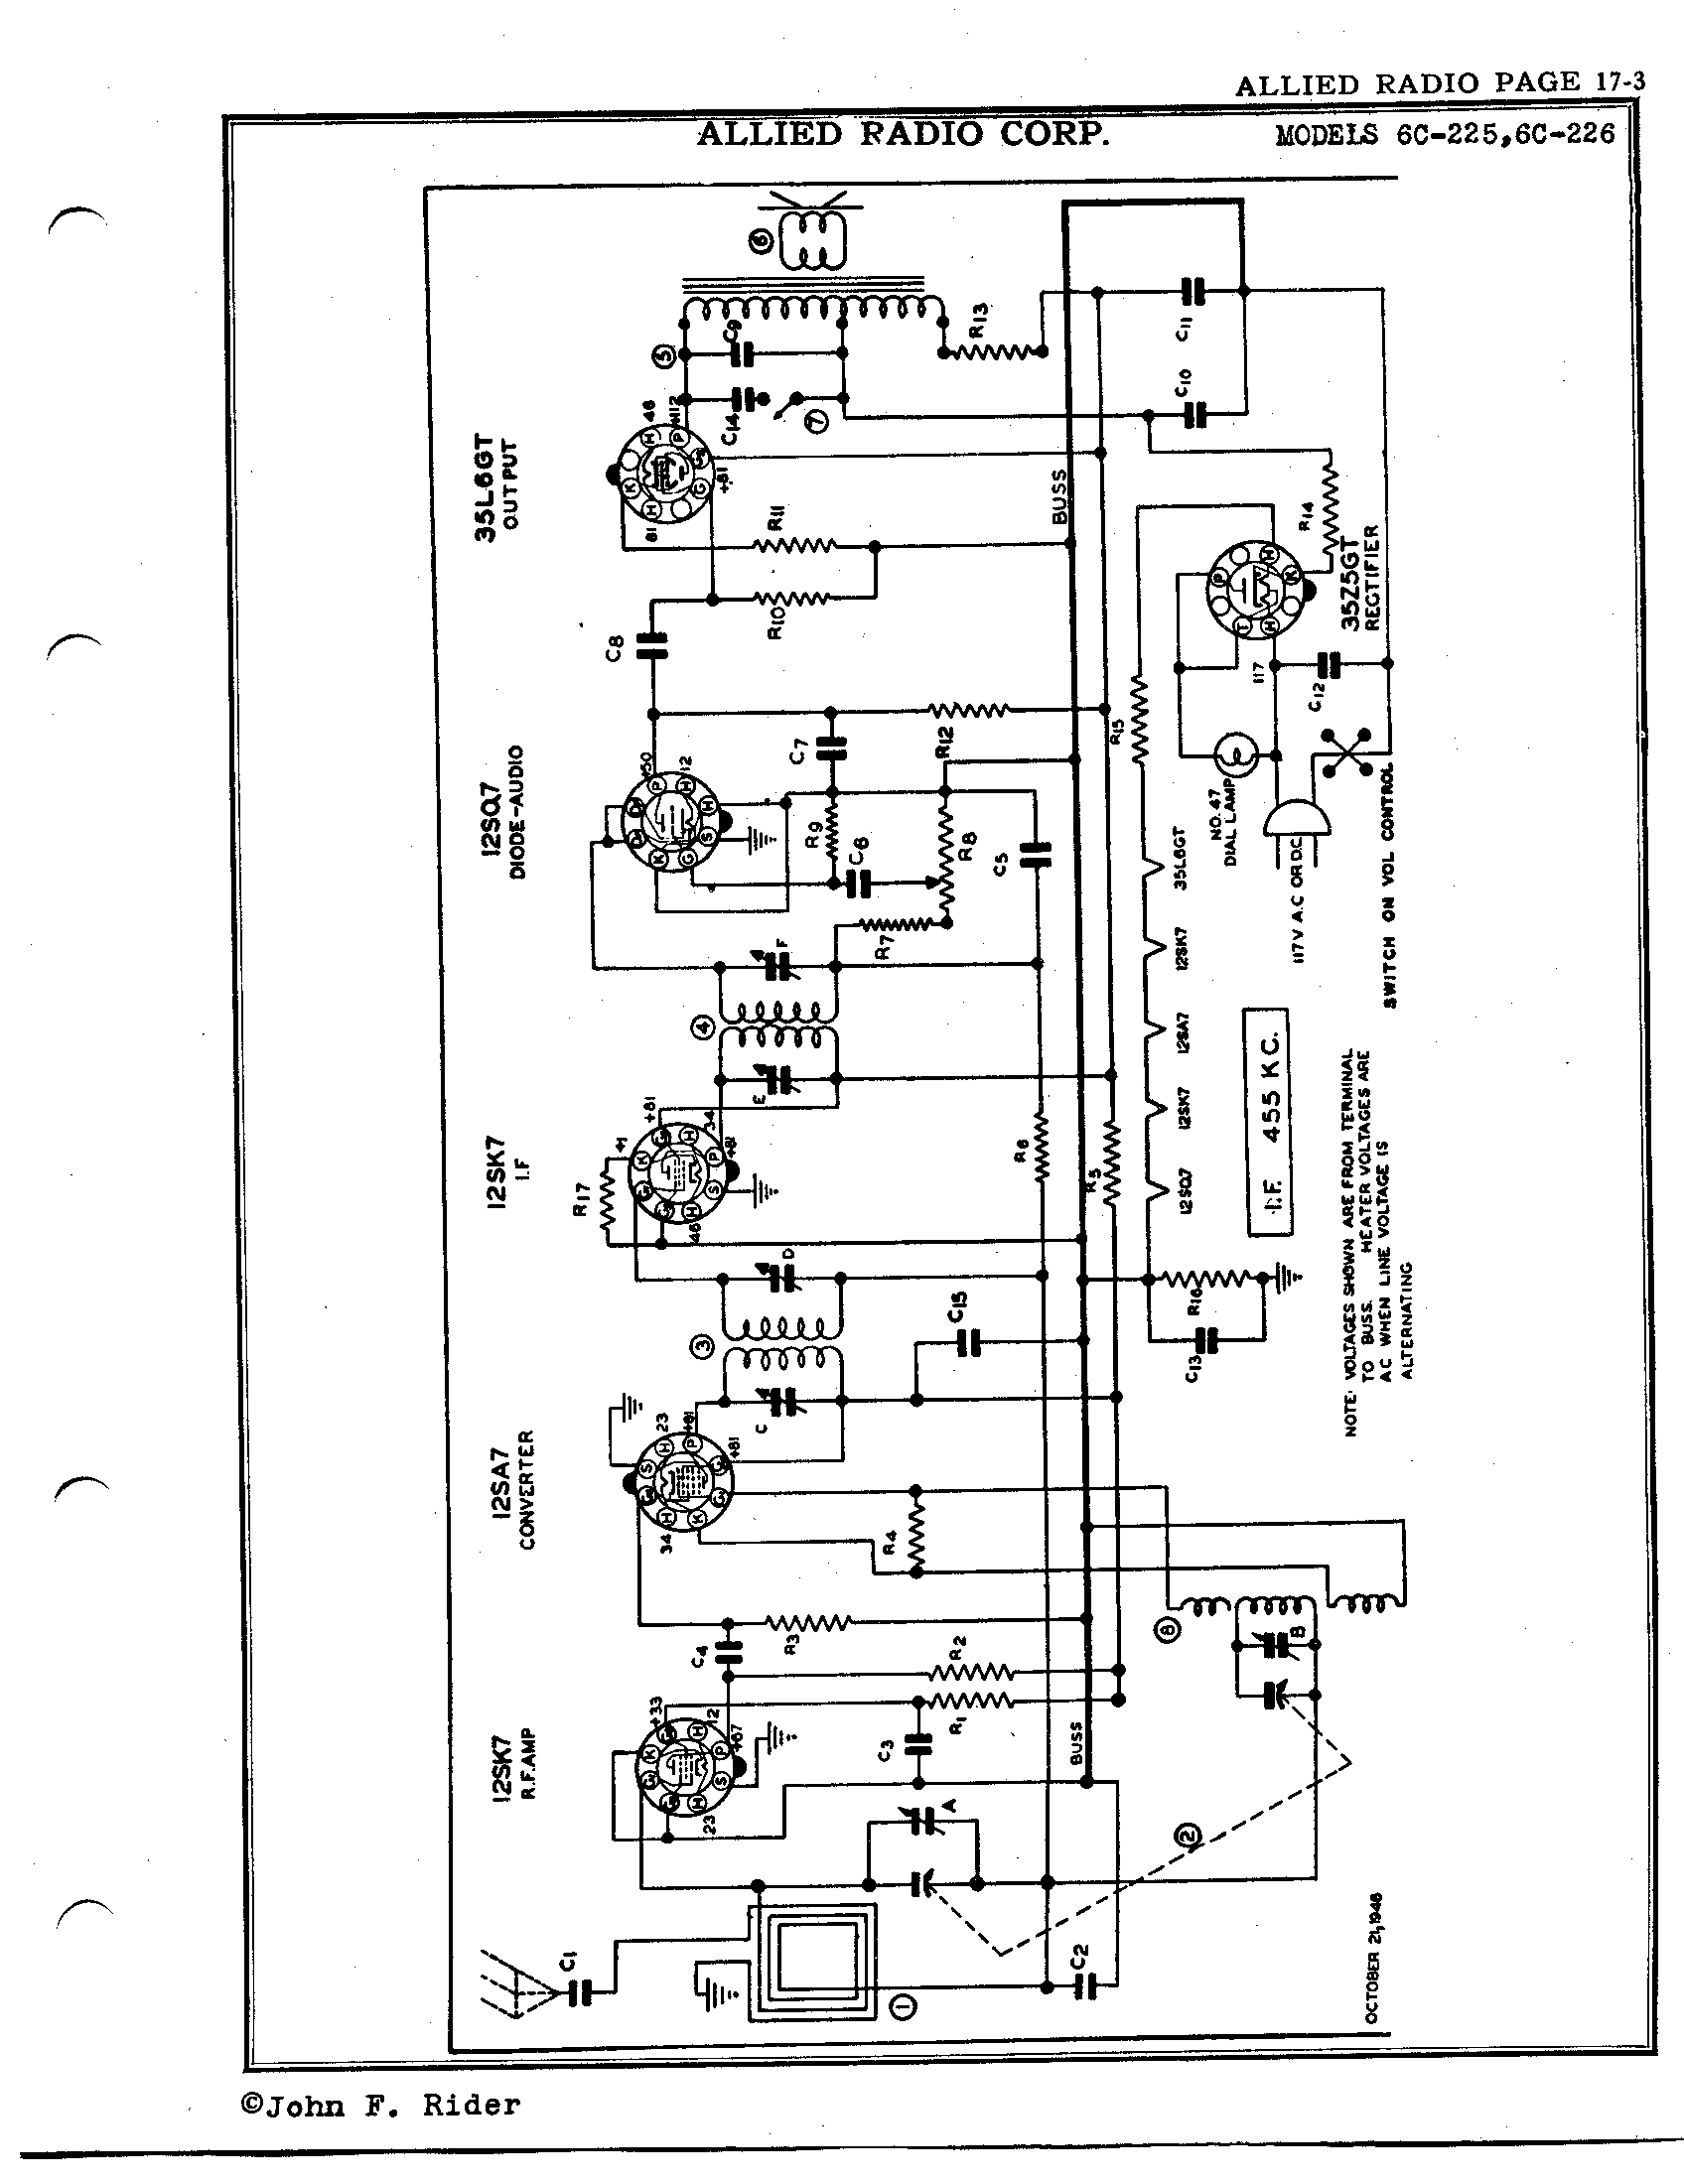 Allied Radio Corp 6c 225